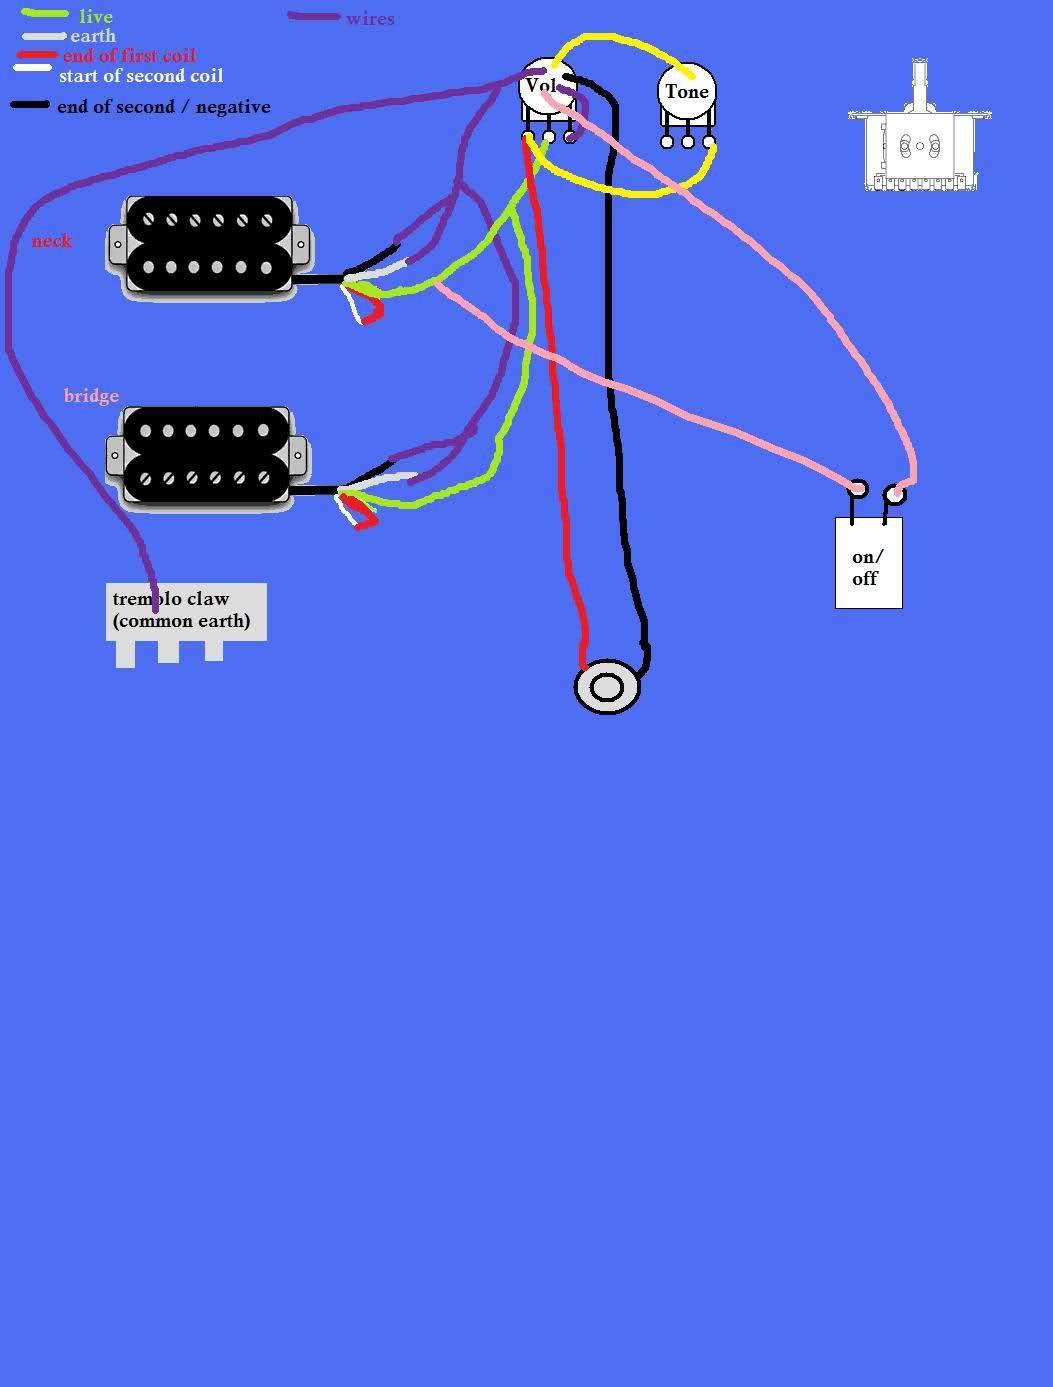 Guitar Wiring Diagrams 2 Pickups 1 Volume 1 Tone | Wiring Diagram - Guitar Wiring Diagram 2 Humbucker 1 Volume 1 Tone